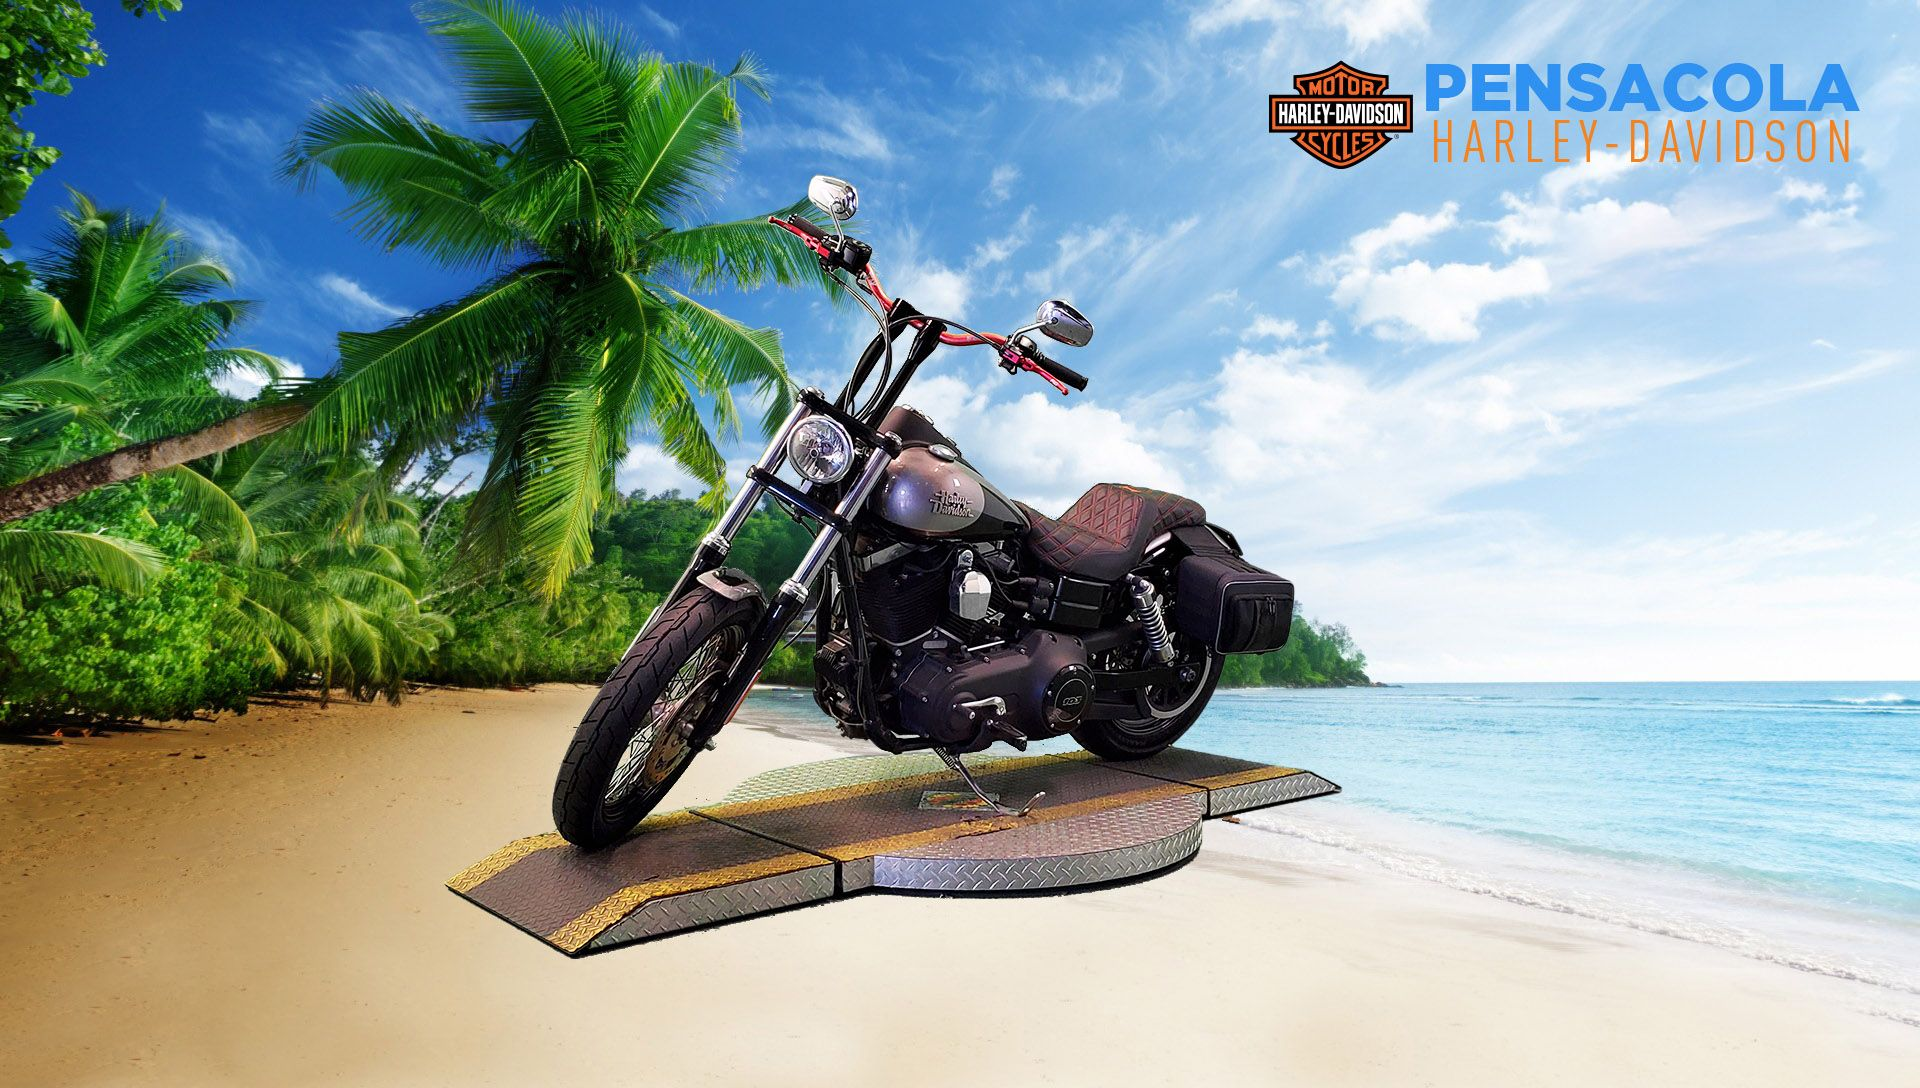 Pre-Owned 2016 Harley-Davidson Street Bob FXDB